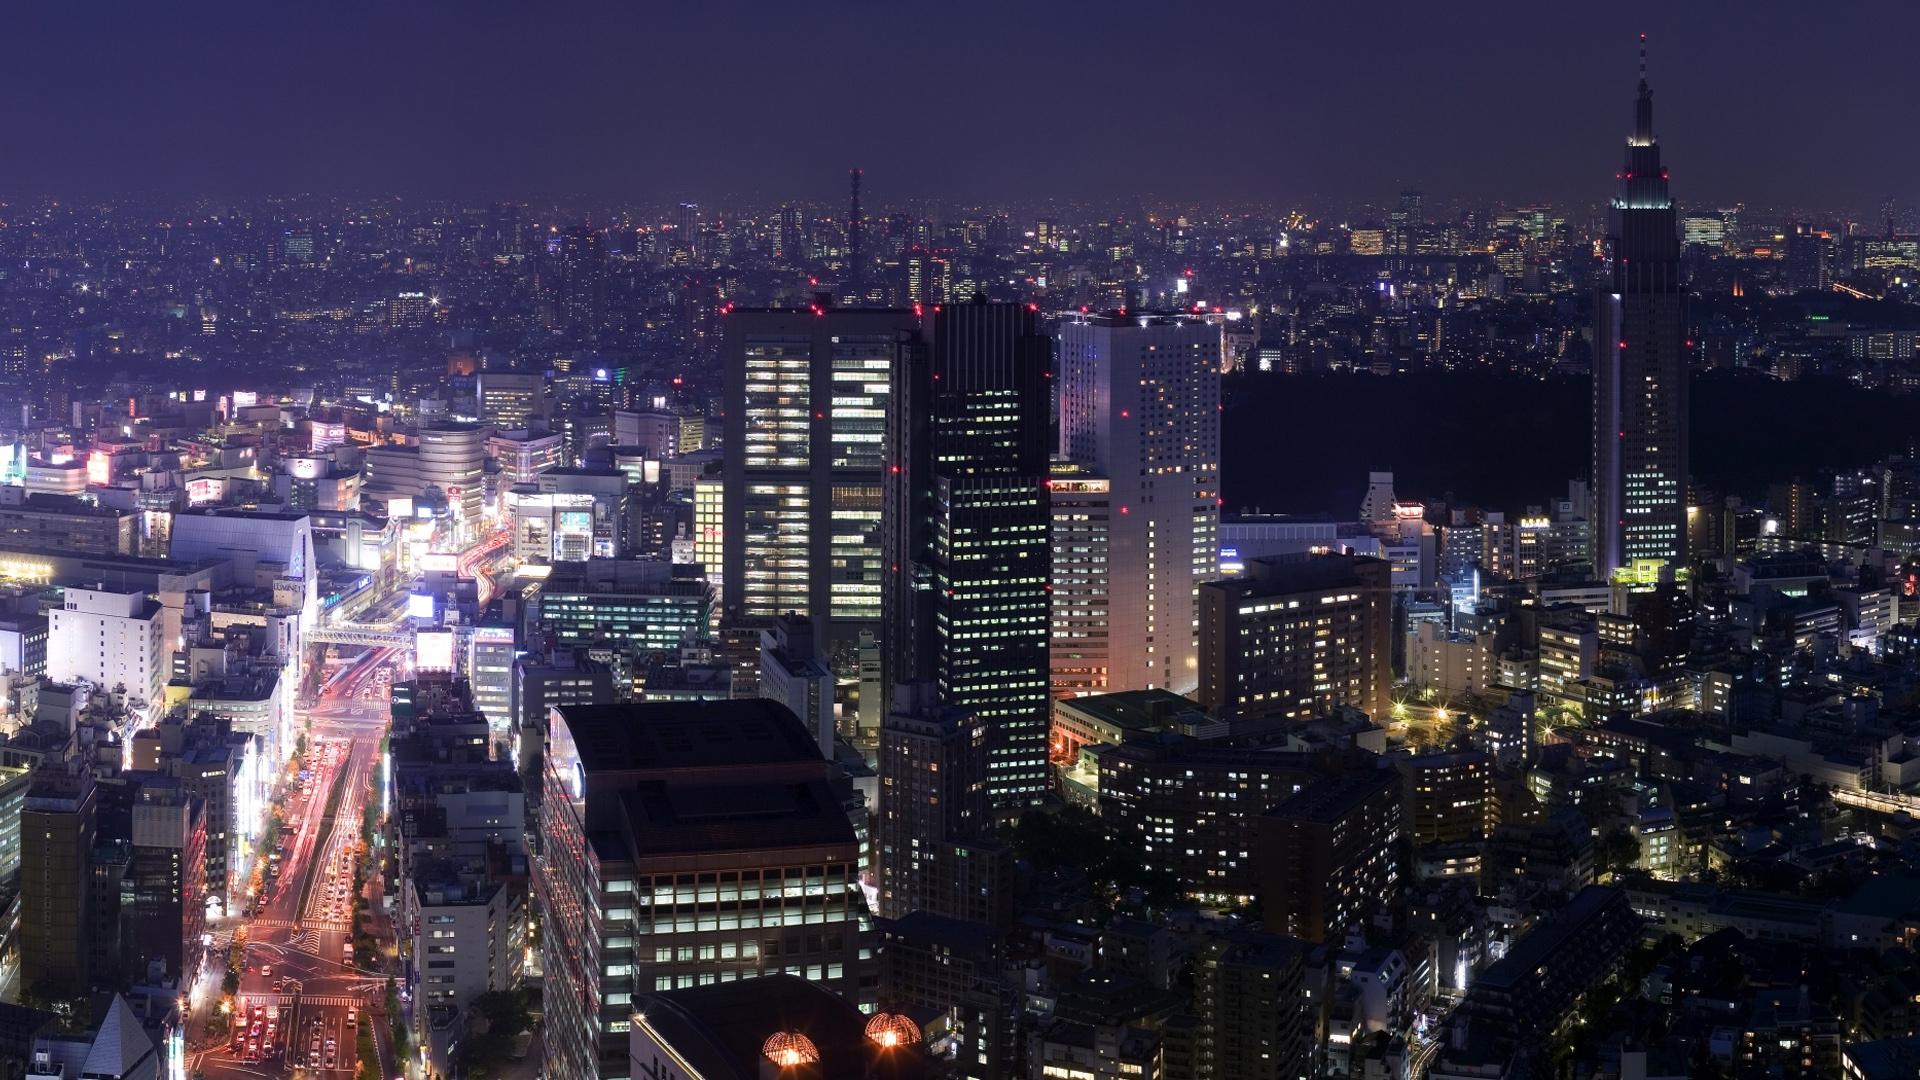 Download Wallpaper 1920x1080 City Night Skyscraper Lilac Full HD